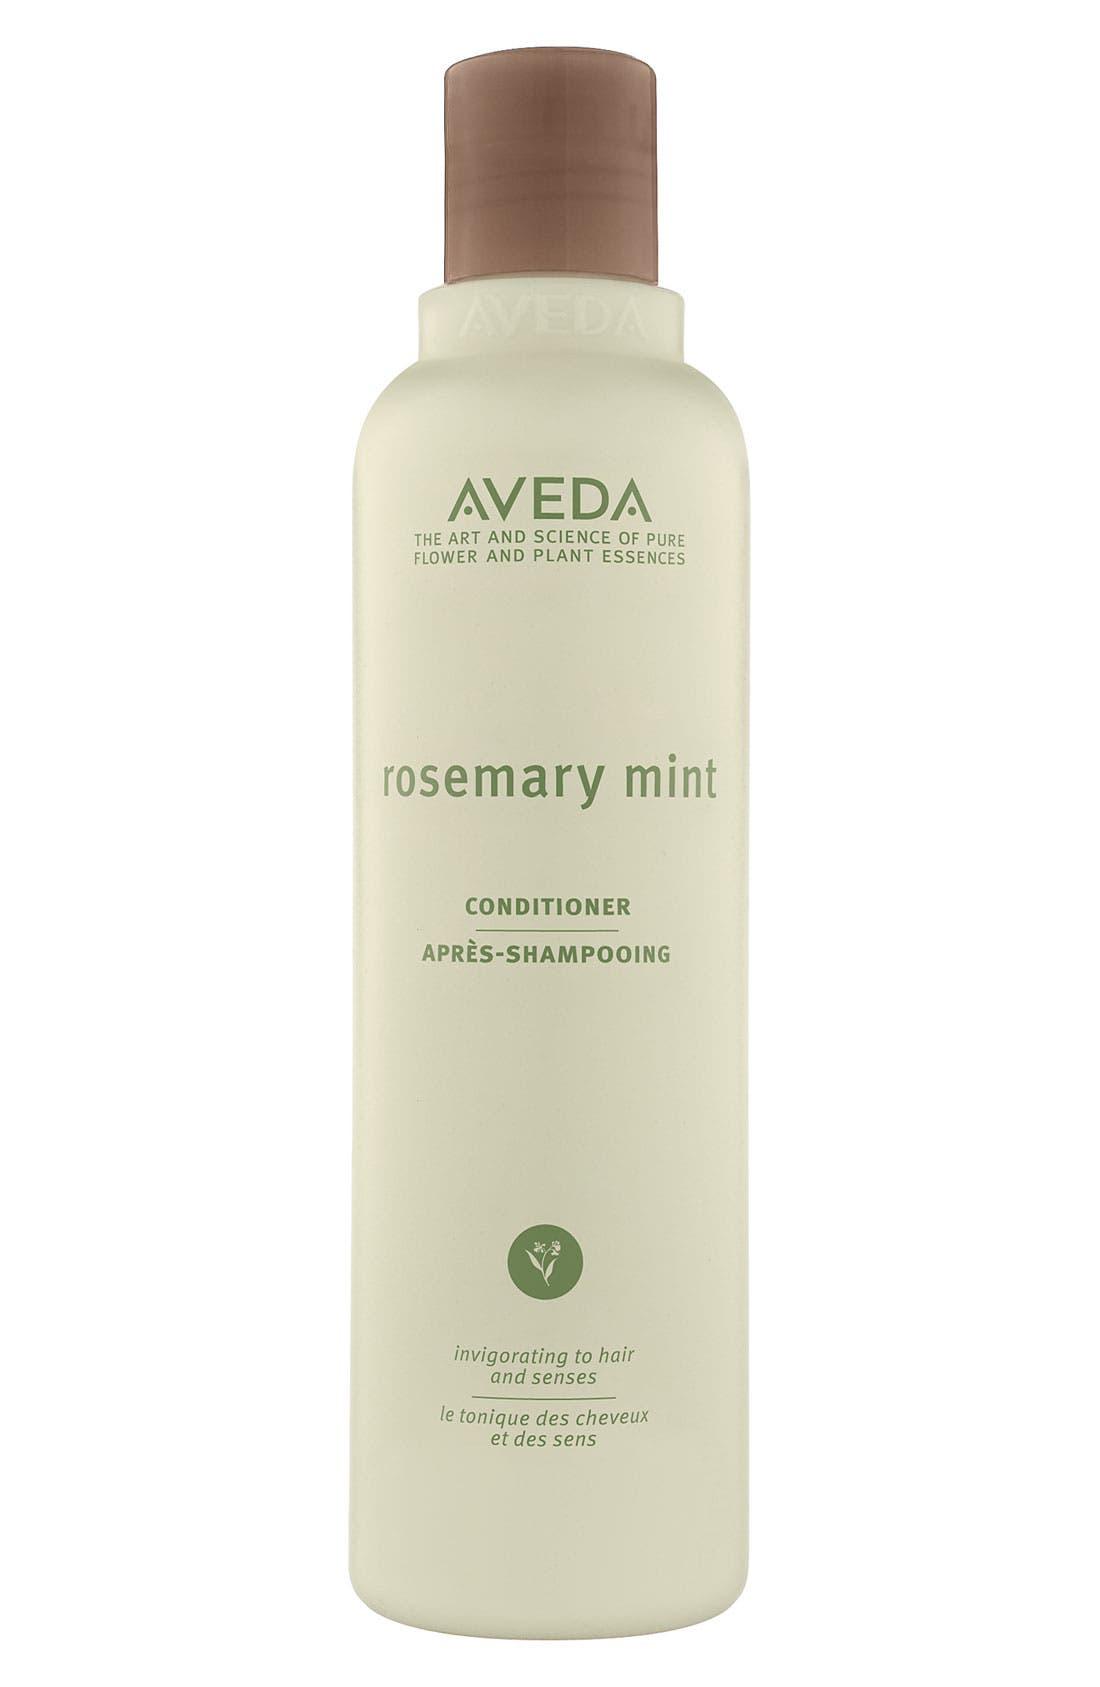 Aveda Rosemary Mint Conditioner